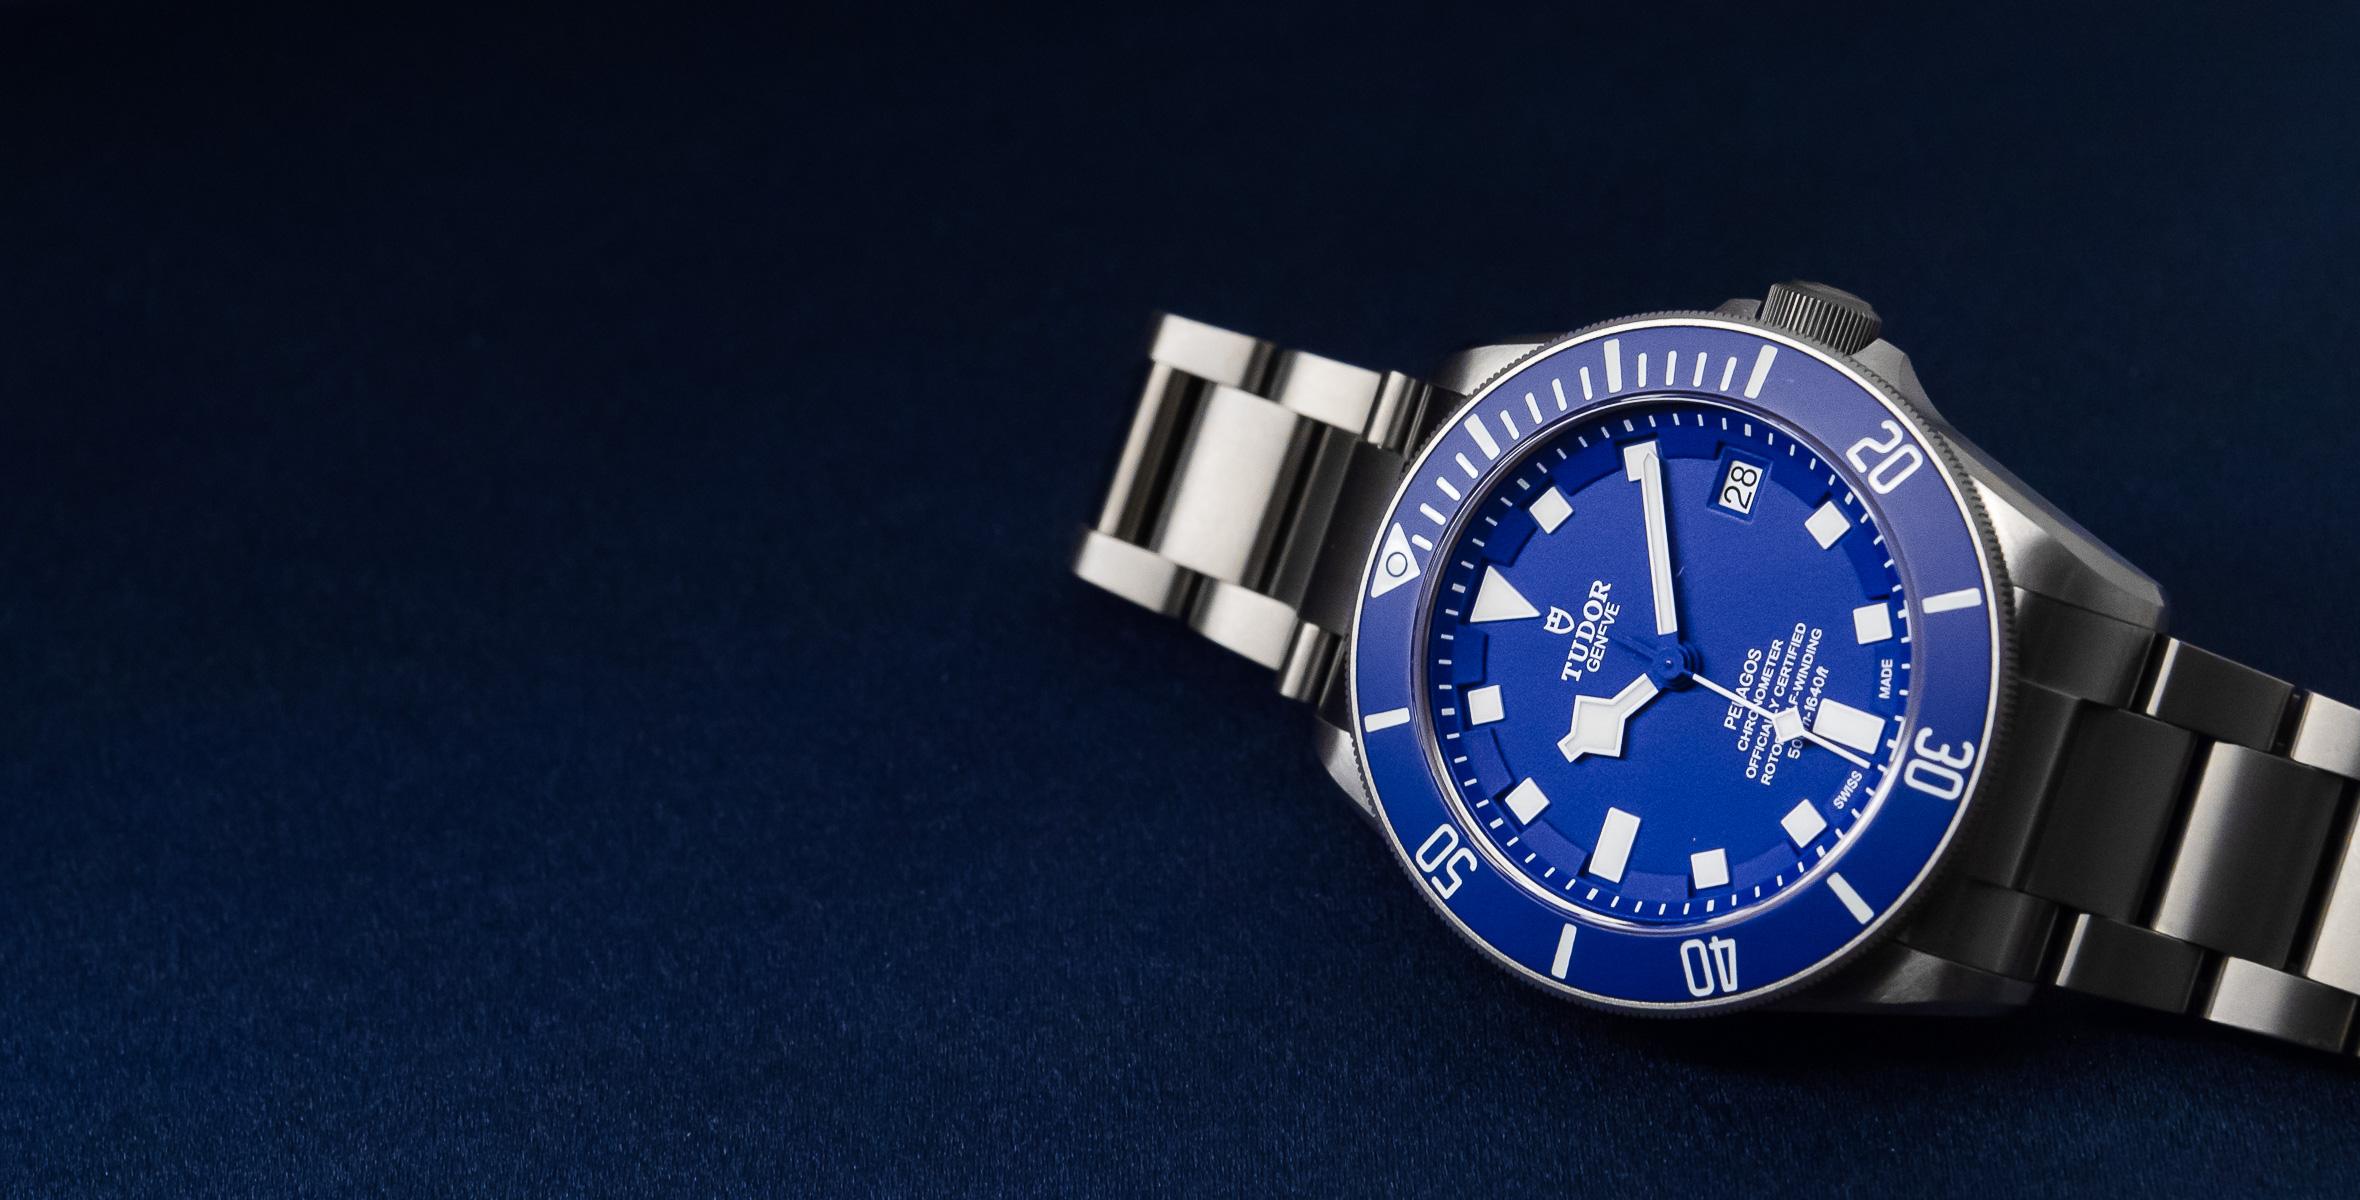 Hands On The Tudor Pelagos Blue Ref 25600tb Time And